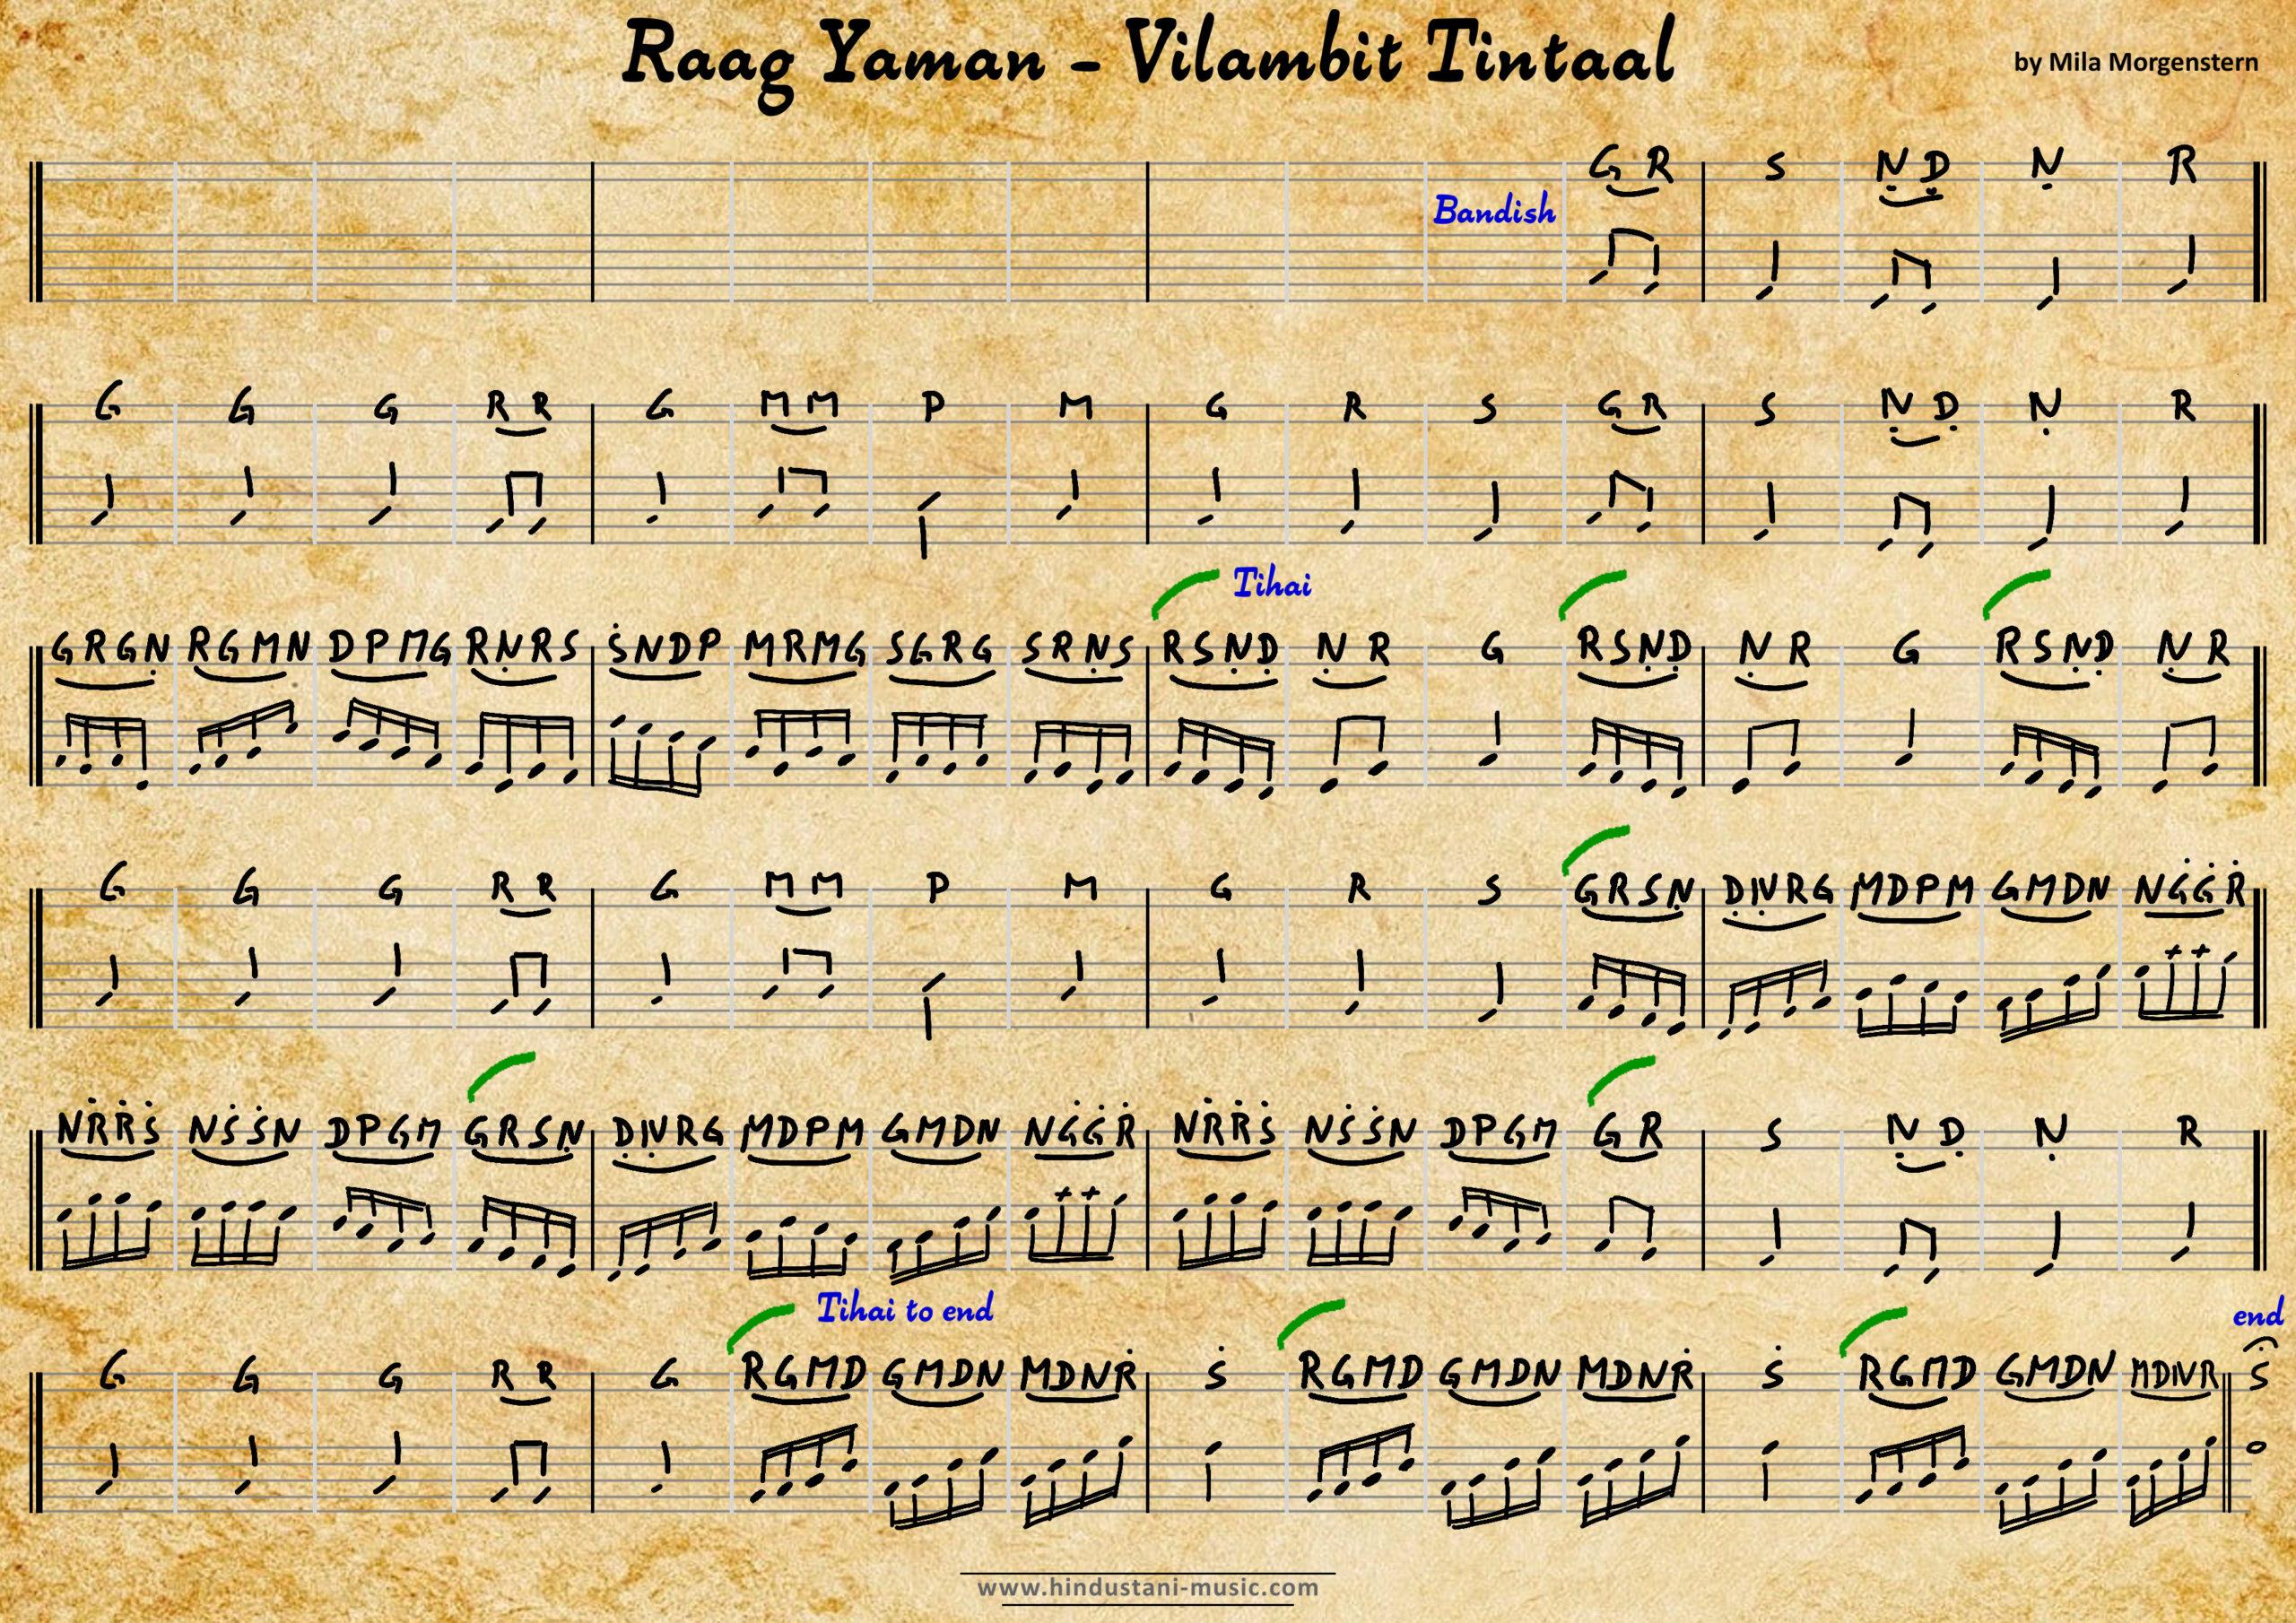 Yaman - MILA MORGENSTERN - Vilambit Tintaal